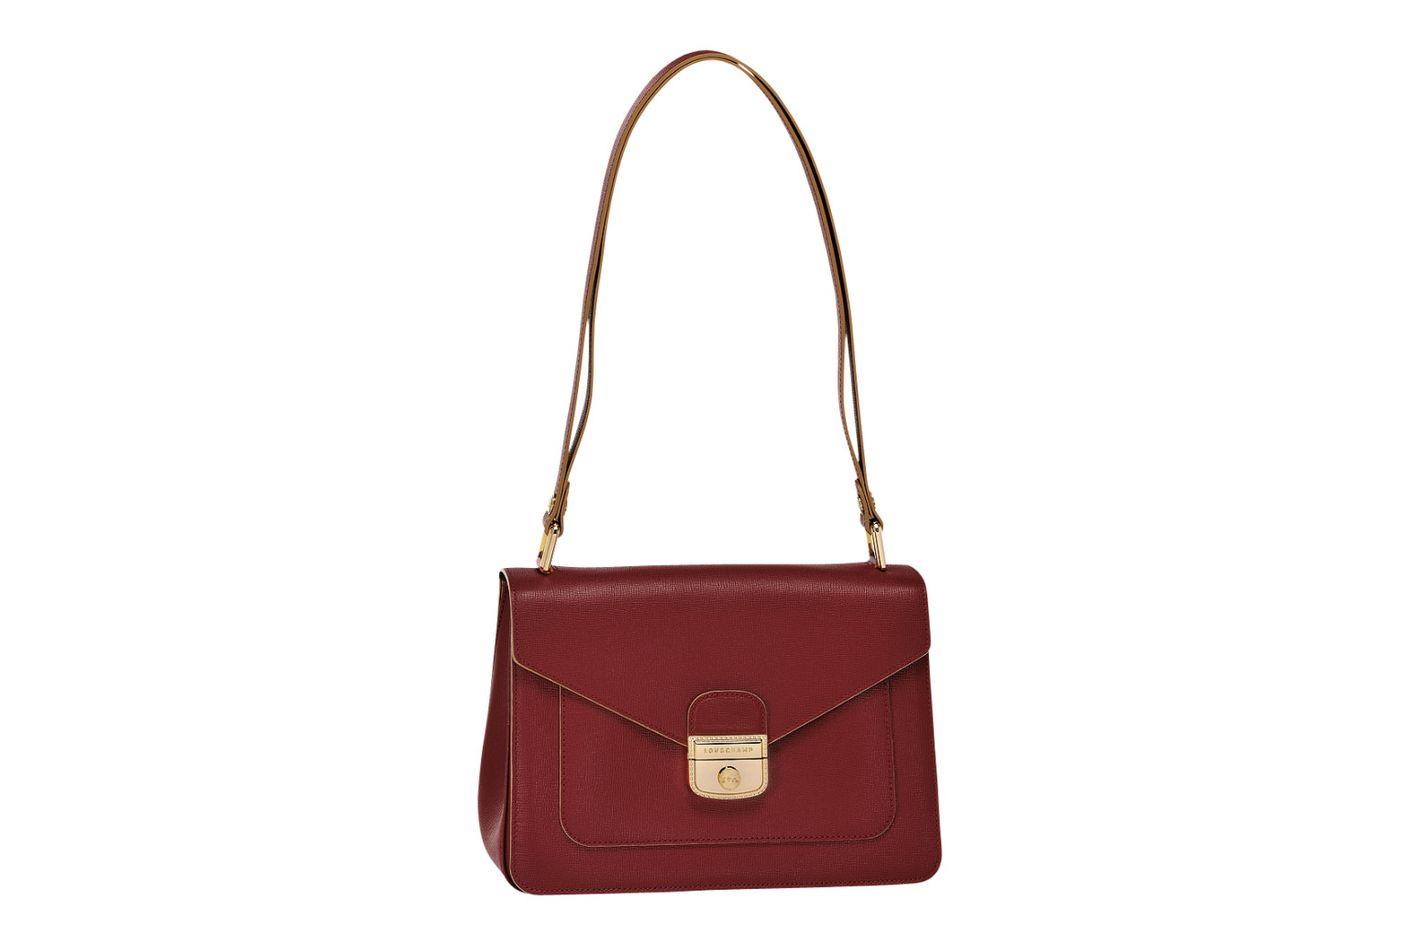 Le Pliage Héritage Hobo Bag